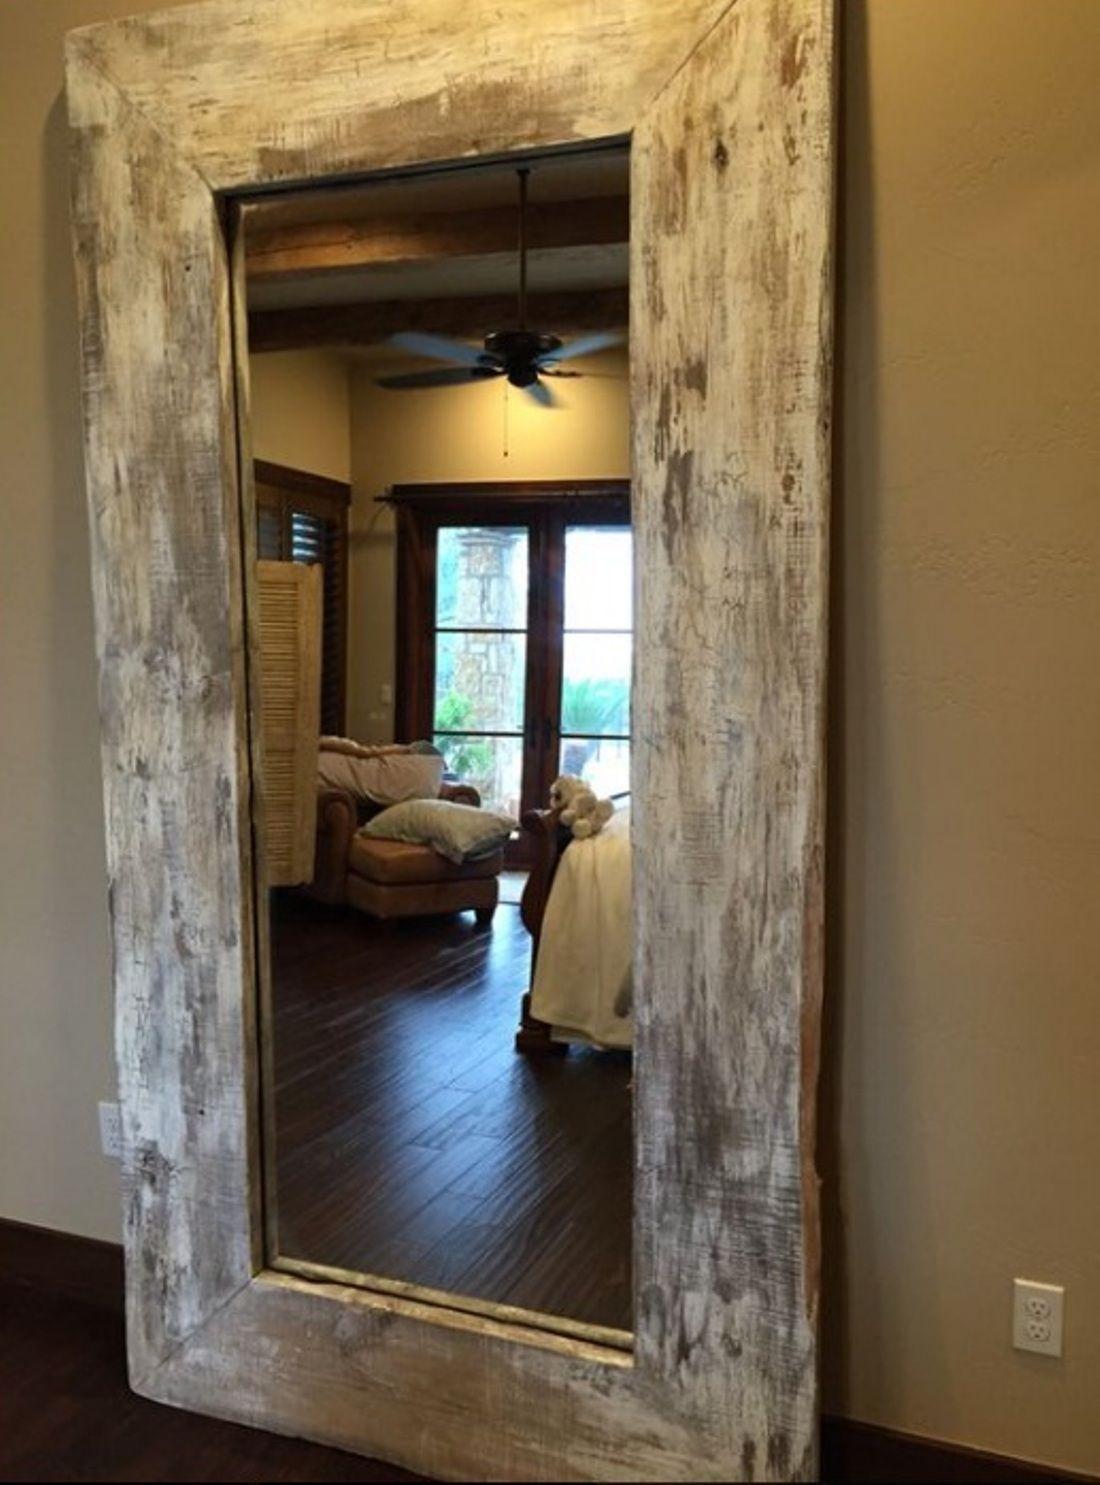 Gorgeous Ideas To Make Large Handmade Full Length Rustic Reclaimed Wood Floor Mirror My Home Decor G Handmade Home Decor Rustic Floor Mirrors Rustic Flooring